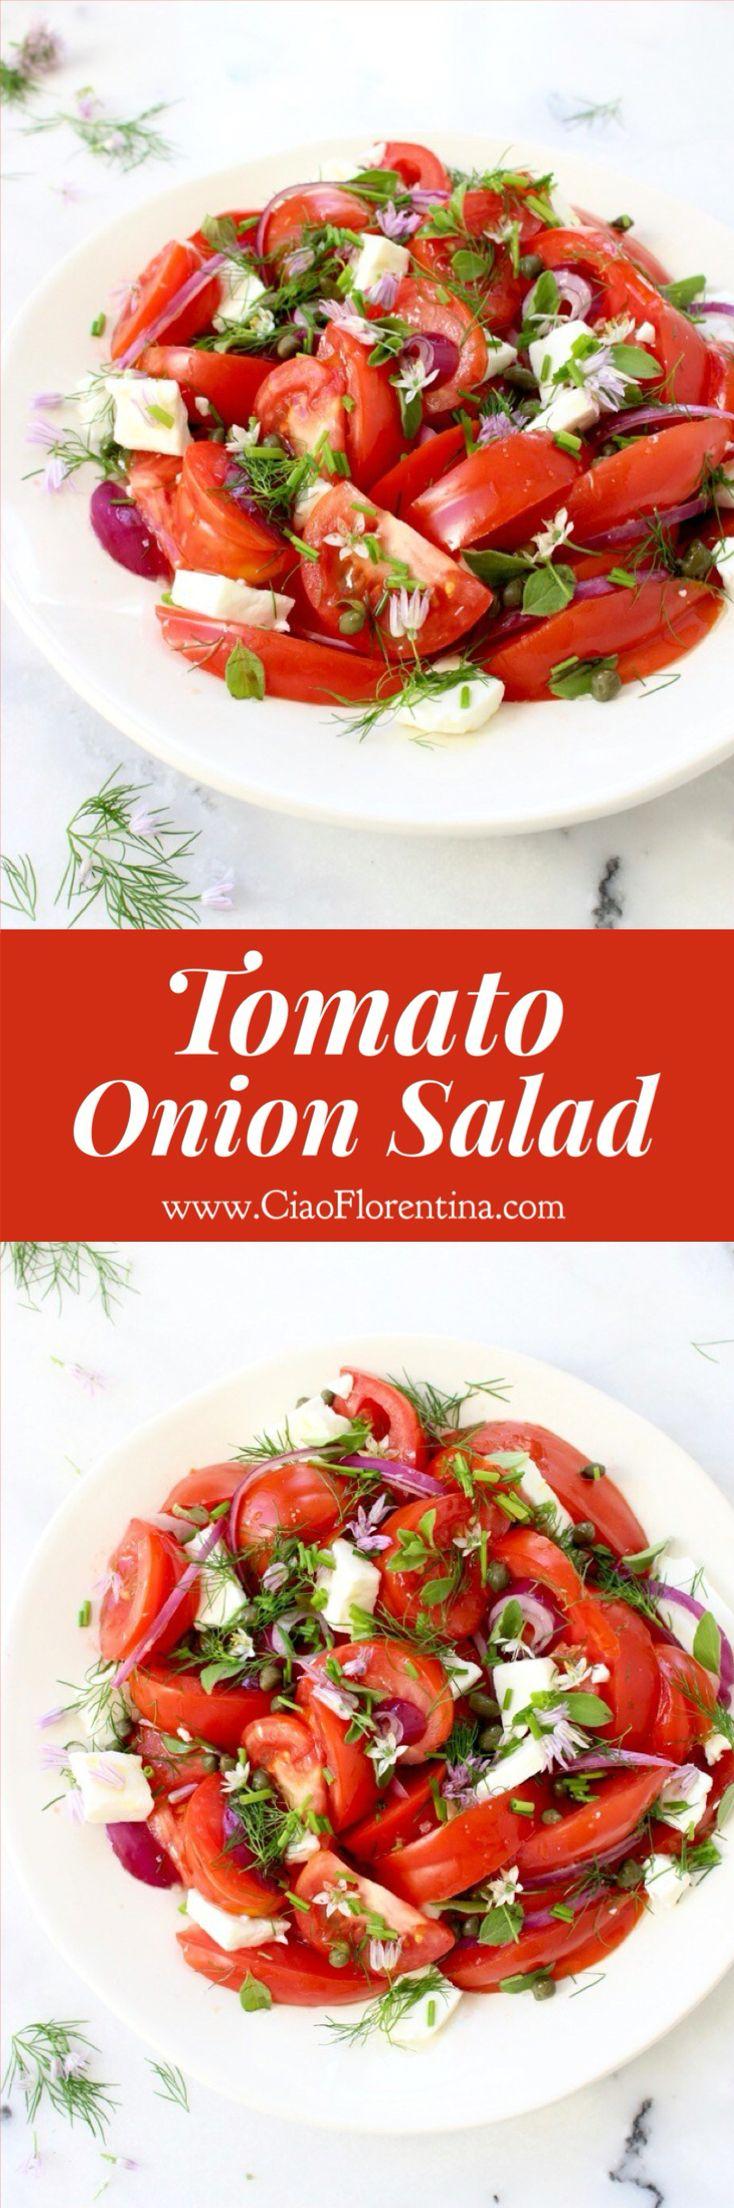 Tomato Onion Salad Recipe with Feta Cheese and Fresh Herbs ( Mediterranean Salad )   CiaoFlorentina.com @CiaoFlorentina